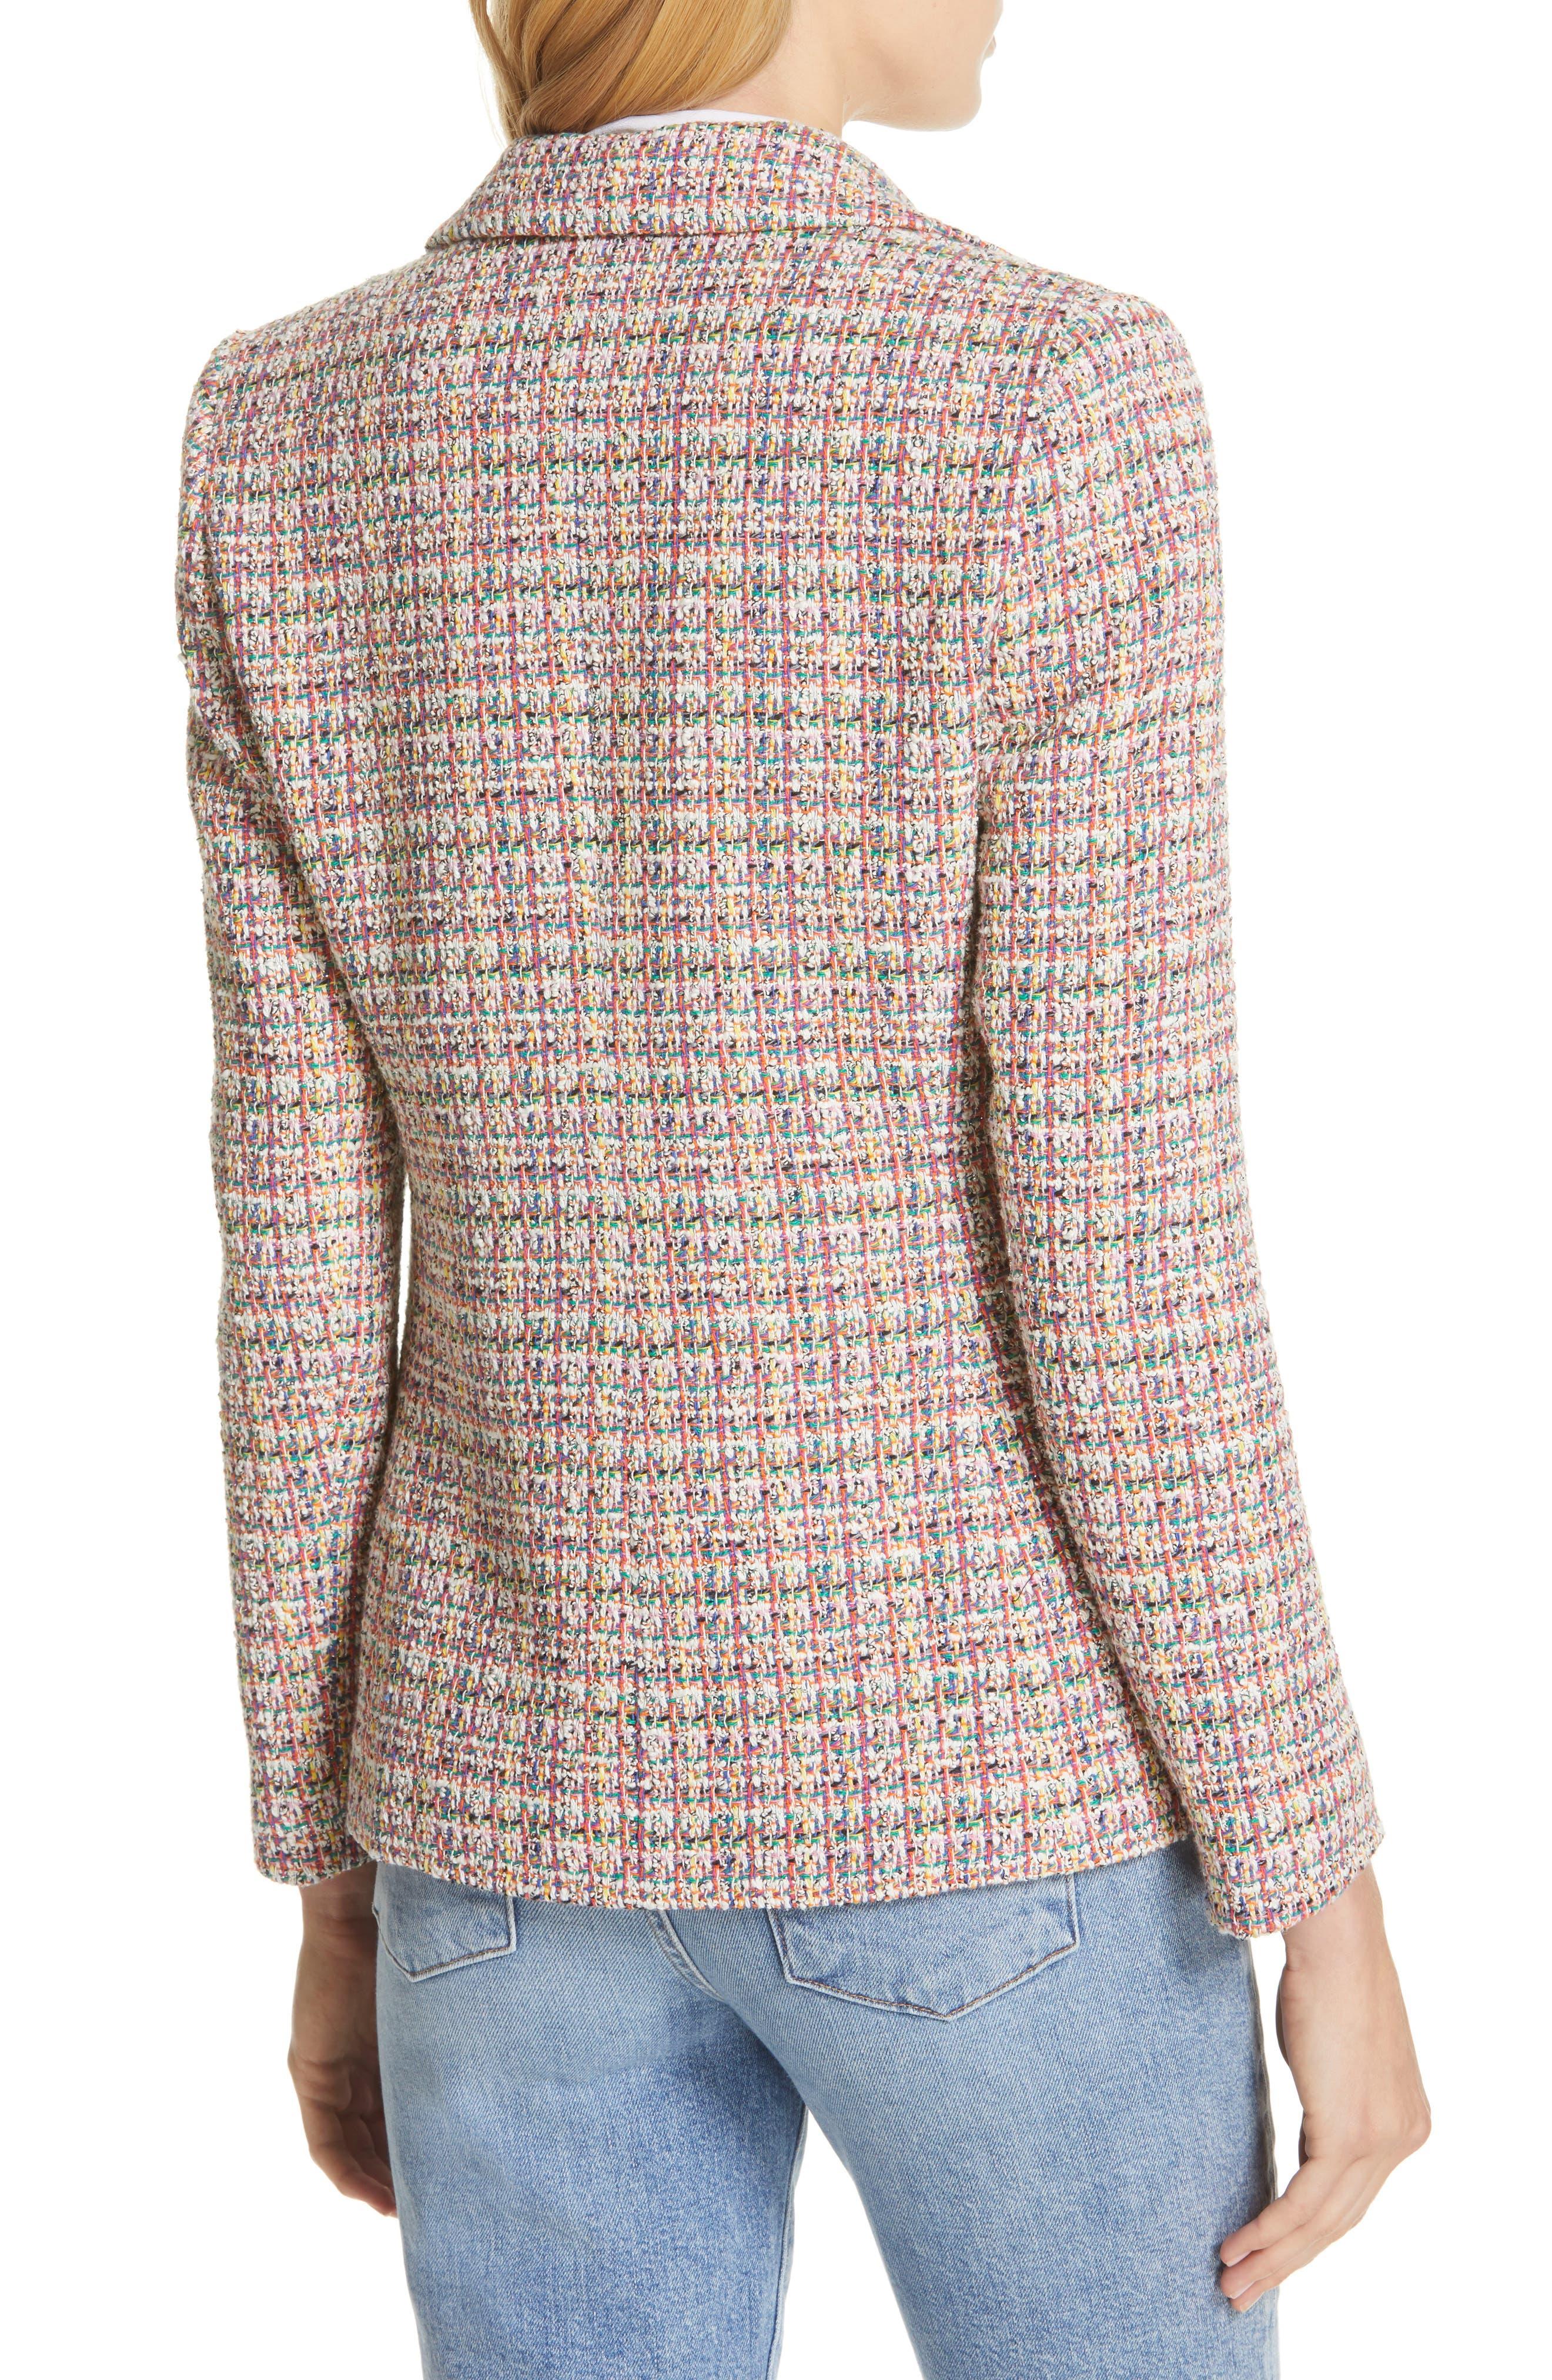 HELENE BERMAN, Colorful Tweed Blazer, Alternate thumbnail 2, color, ORANGE